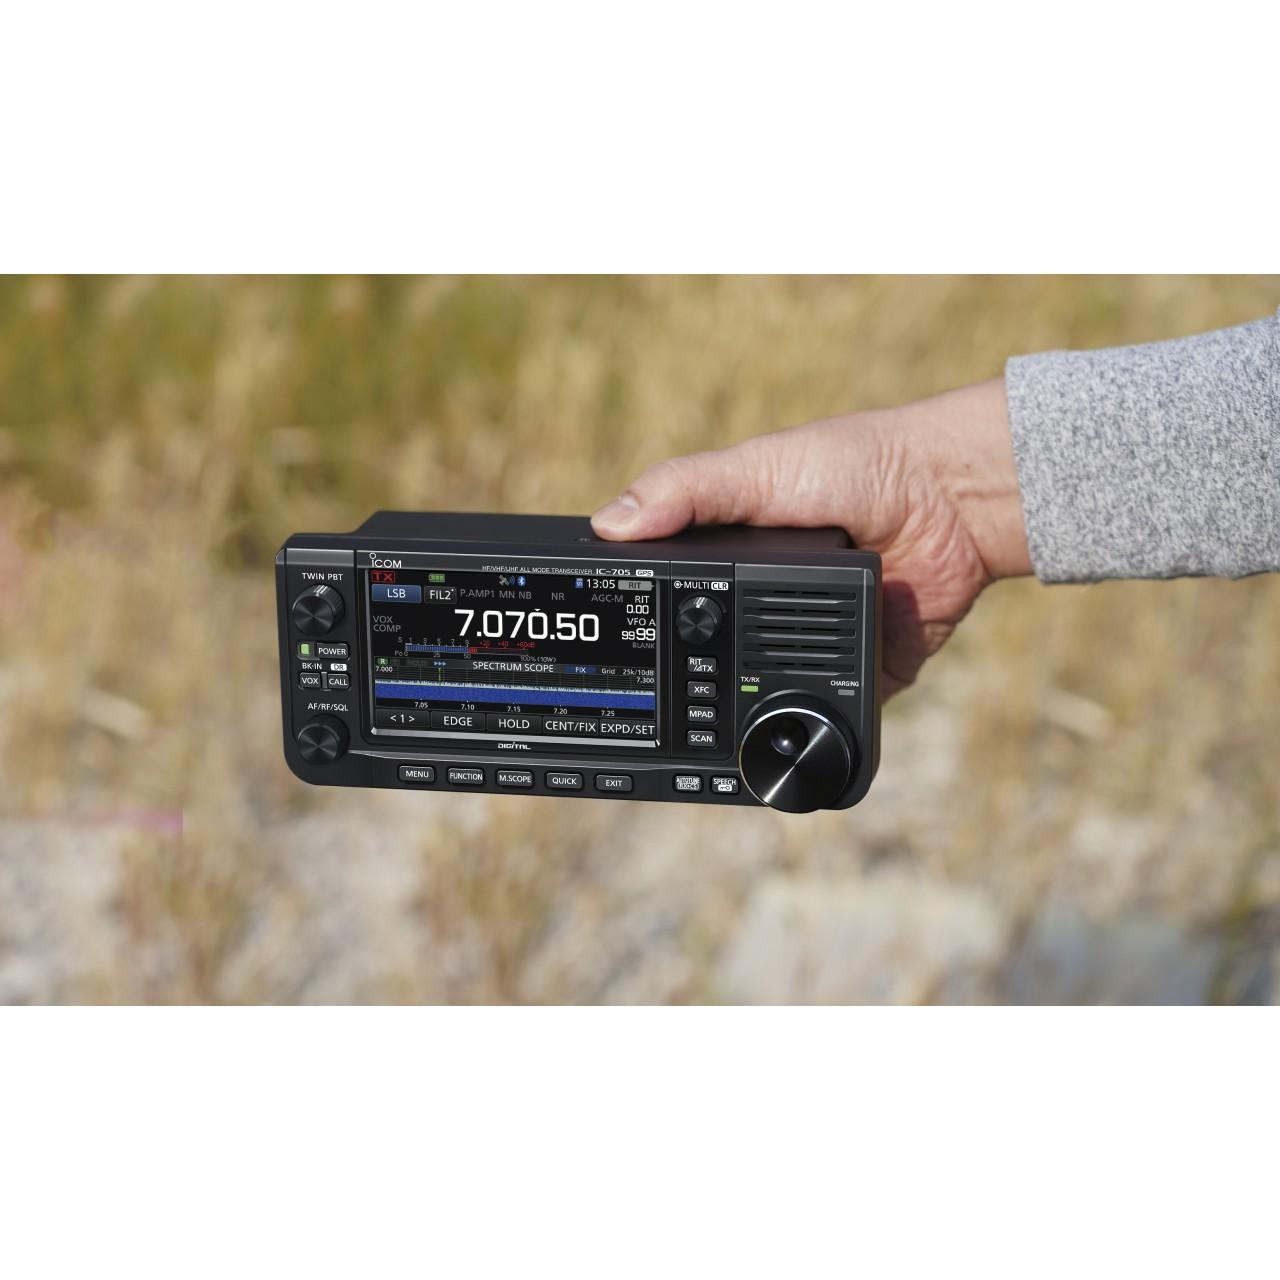 IC-705 à la main